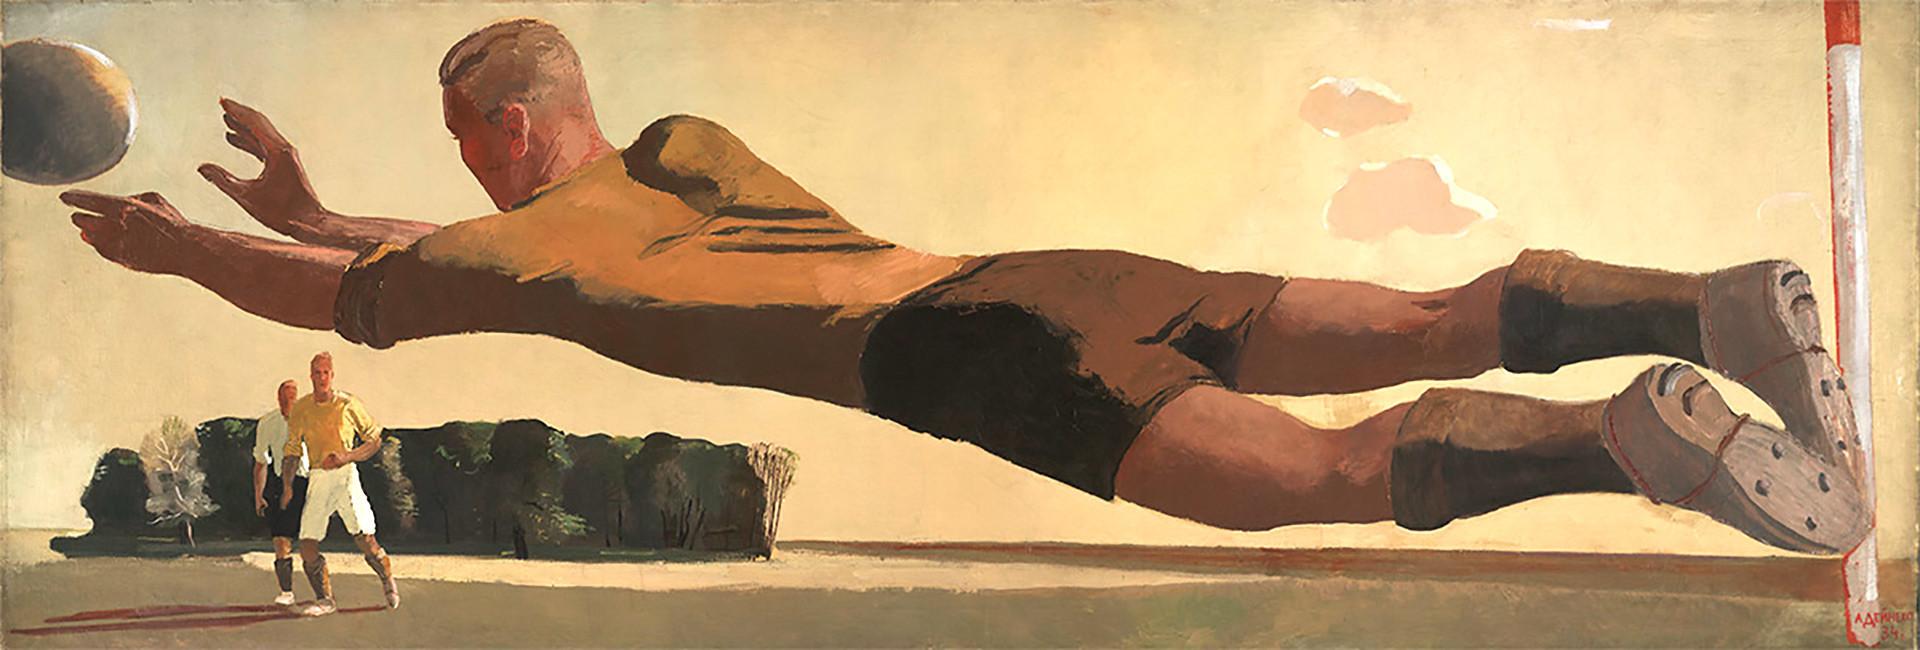 'Goalkeeper' (1934) oleh Alexander Deineka